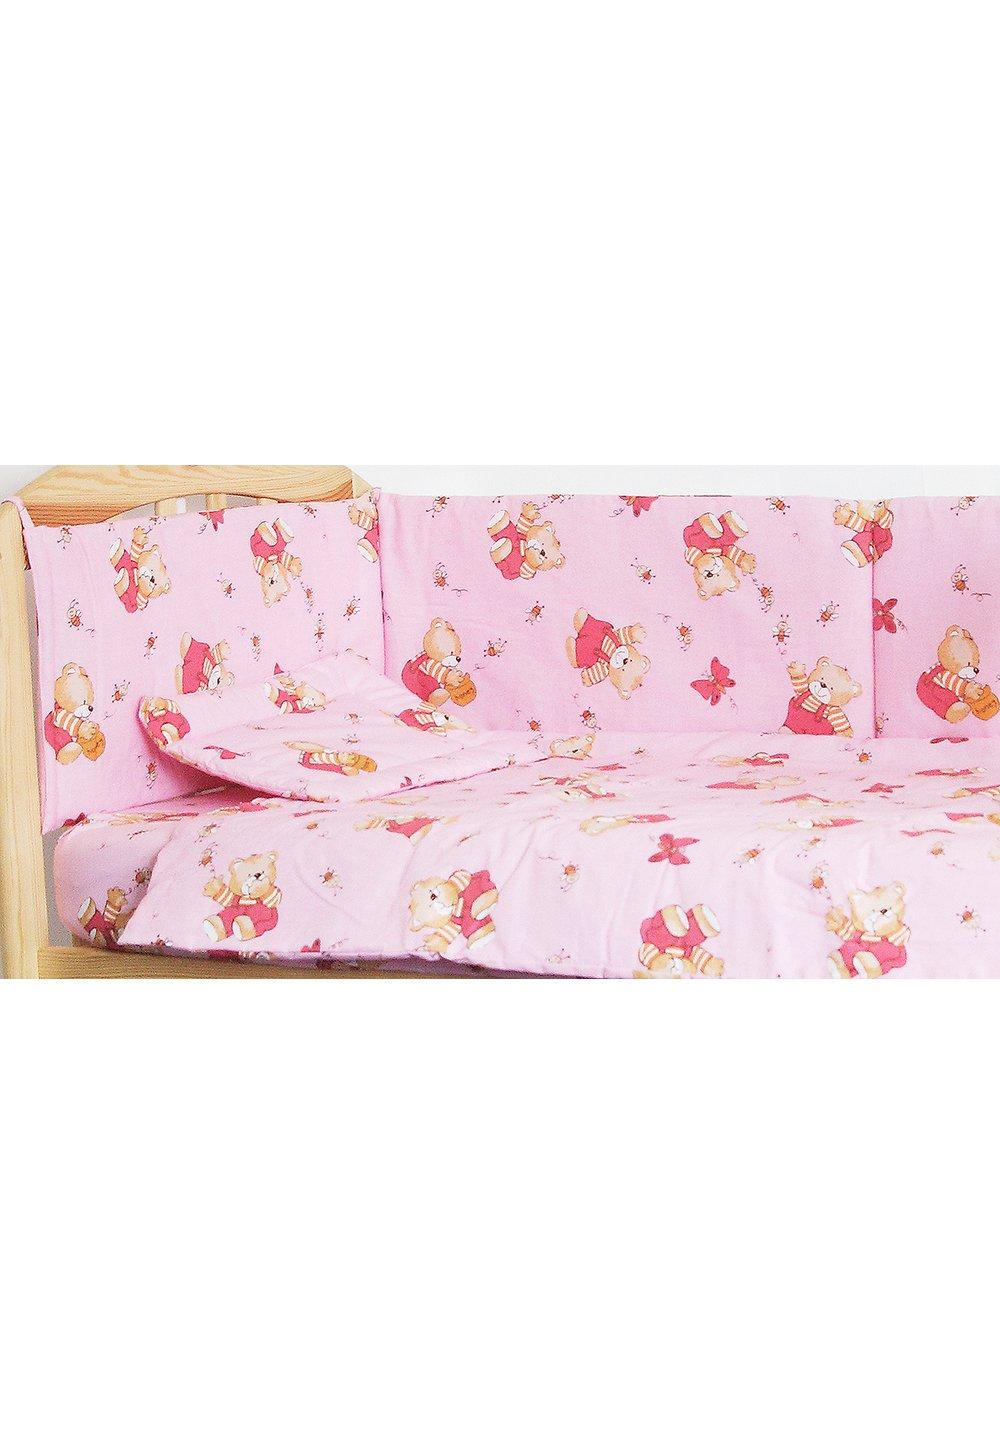 Lenjerie ursulet cu albinute roz,4 piese imagine